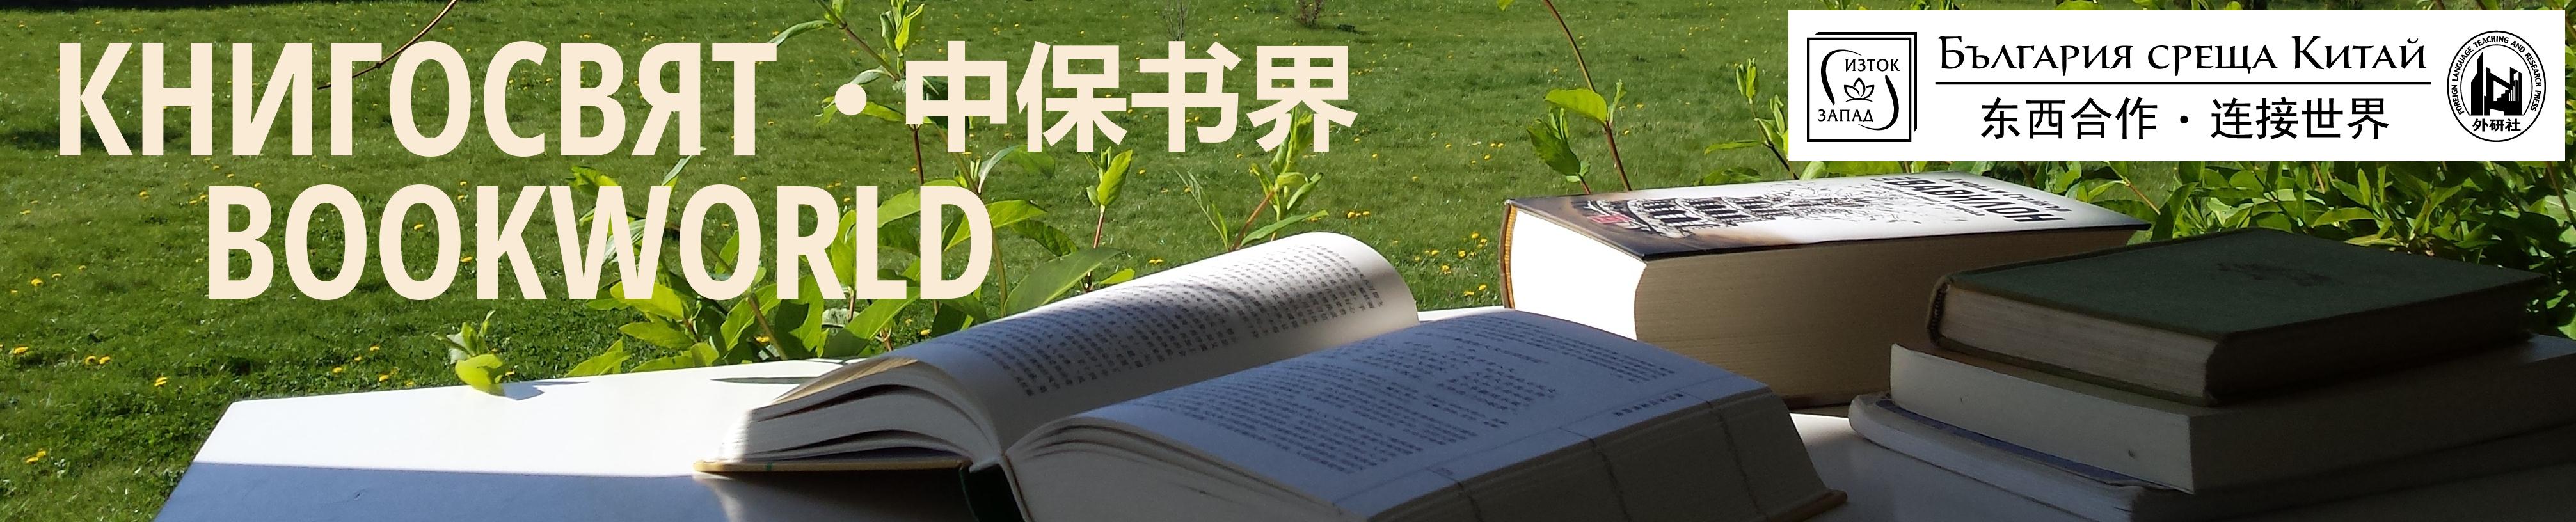 КНИГОСВЯТ ~ BOOKWORLD ~ 中保书界